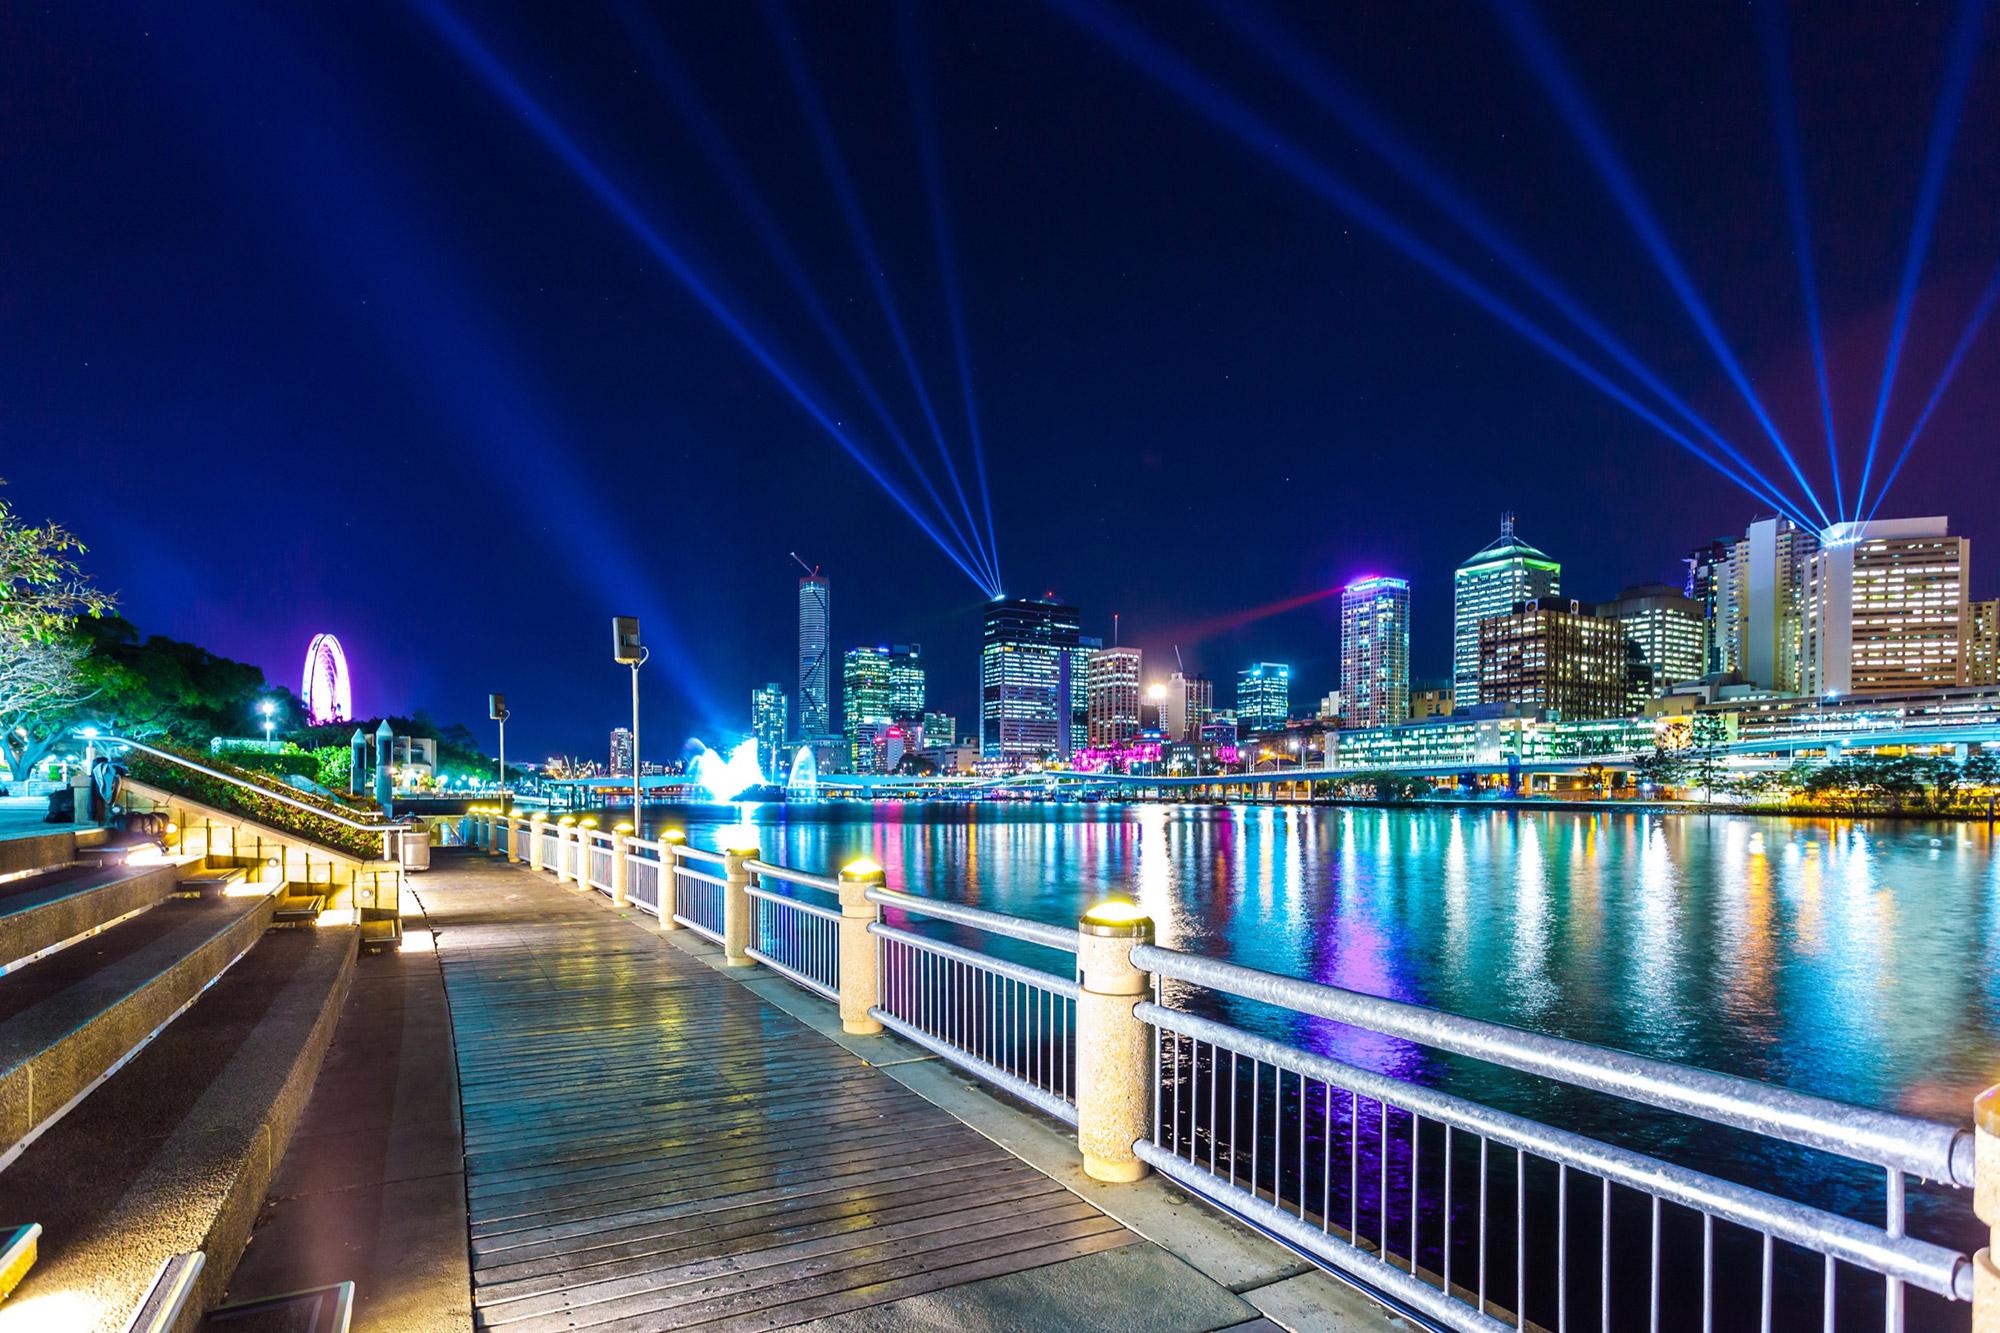 City-Of-Lights-_-Marc-Ilicic-Creative.jpg